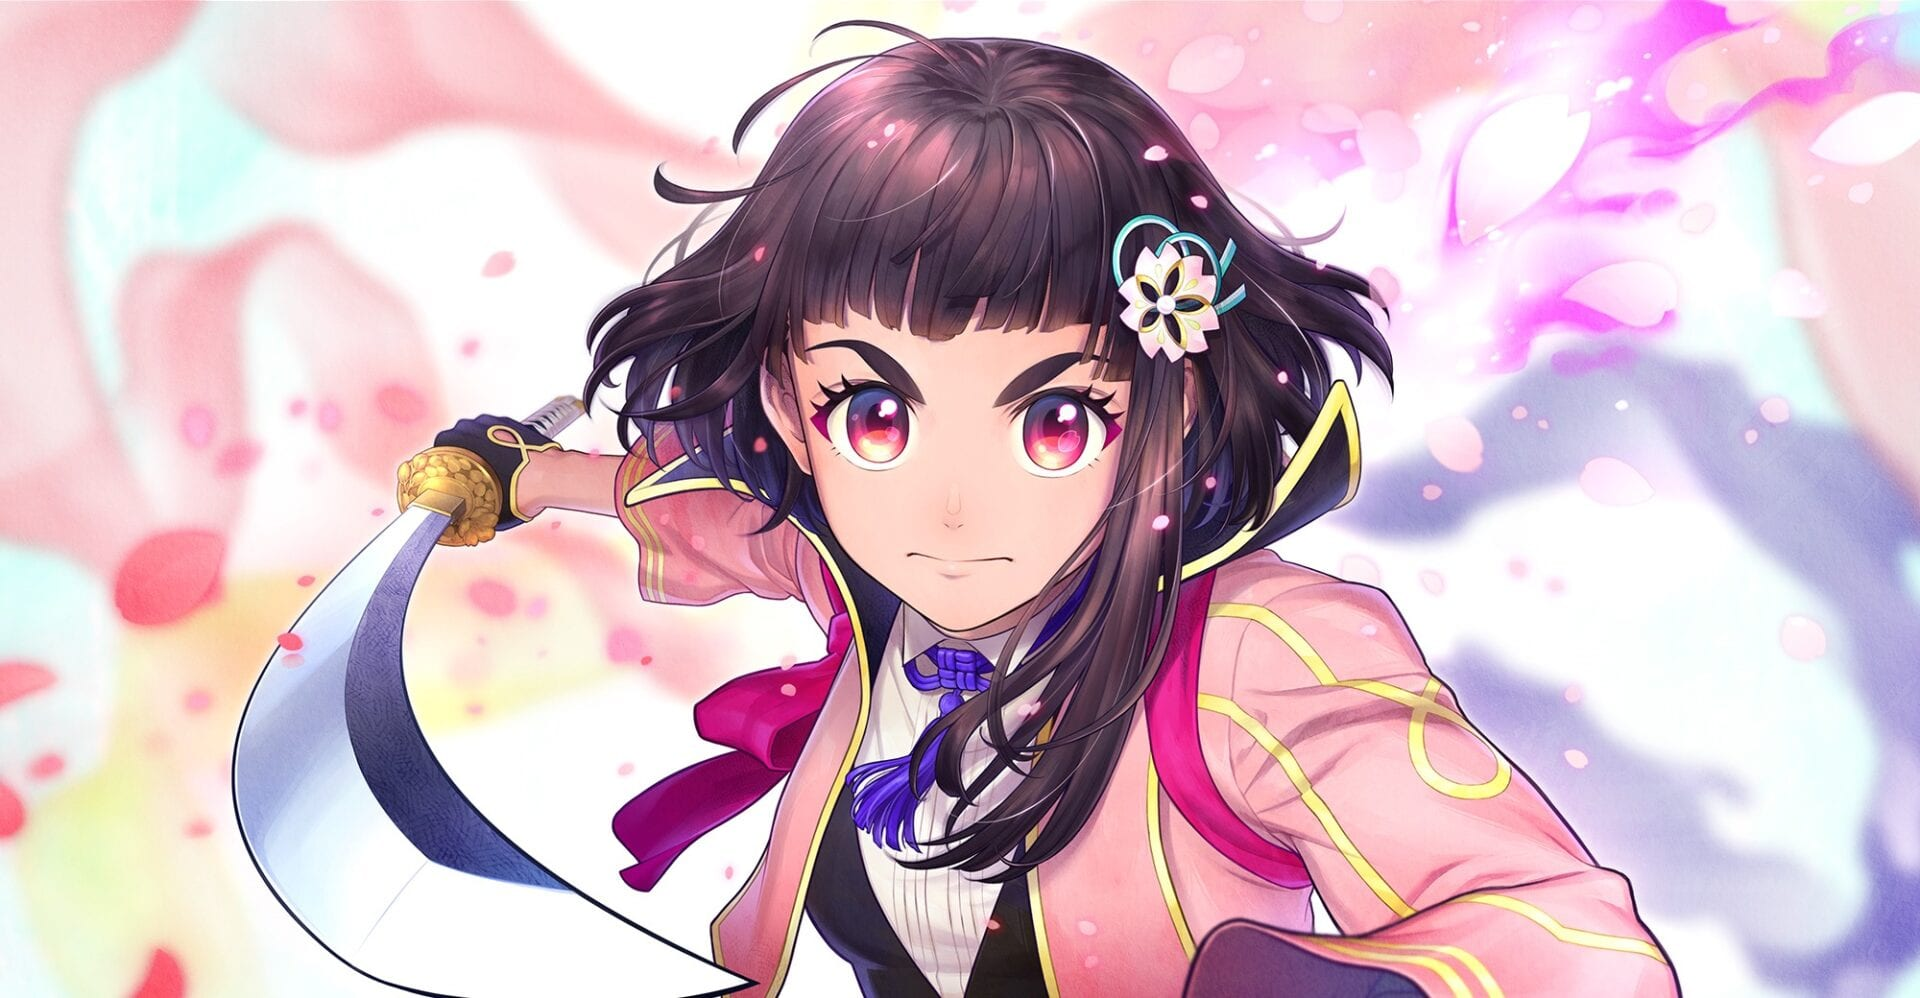 New Sakura Wars Recreation Sakura Revolution Will get New Trailer Exhibiting Even Extra Waifus 1